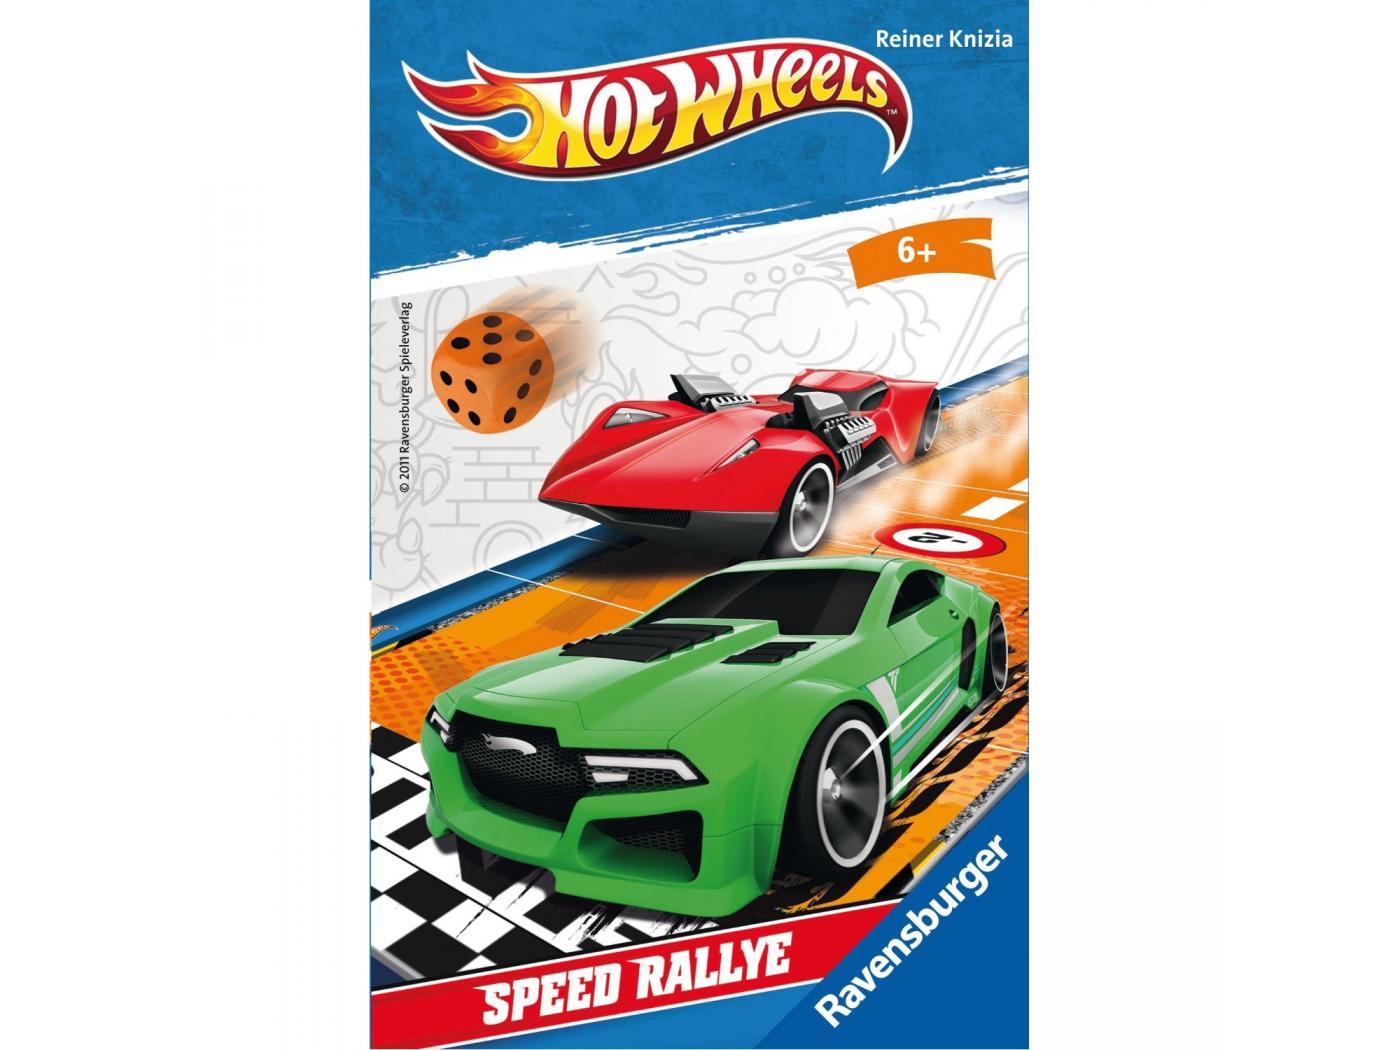 ravensburger hot wheels speed rallye mini jeux. Black Bedroom Furniture Sets. Home Design Ideas